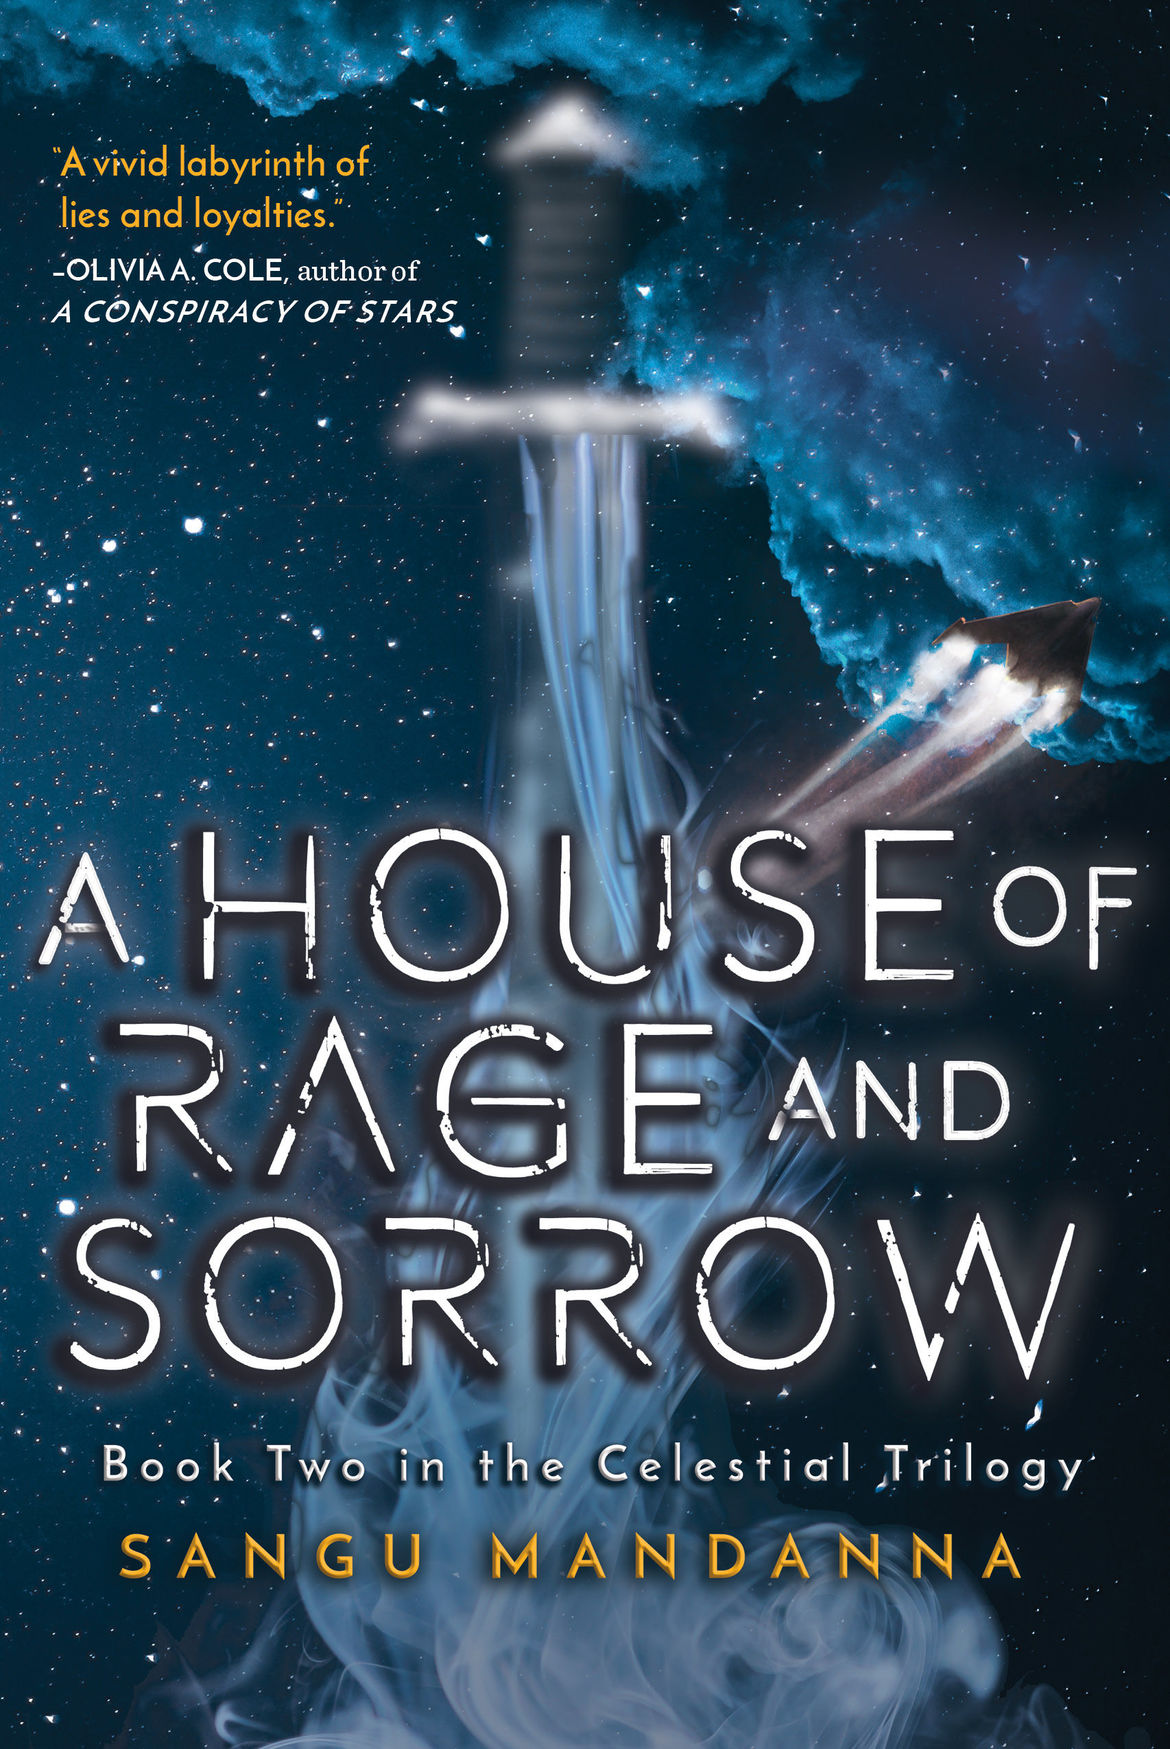 house of rage and sorrow by sangu mandanna